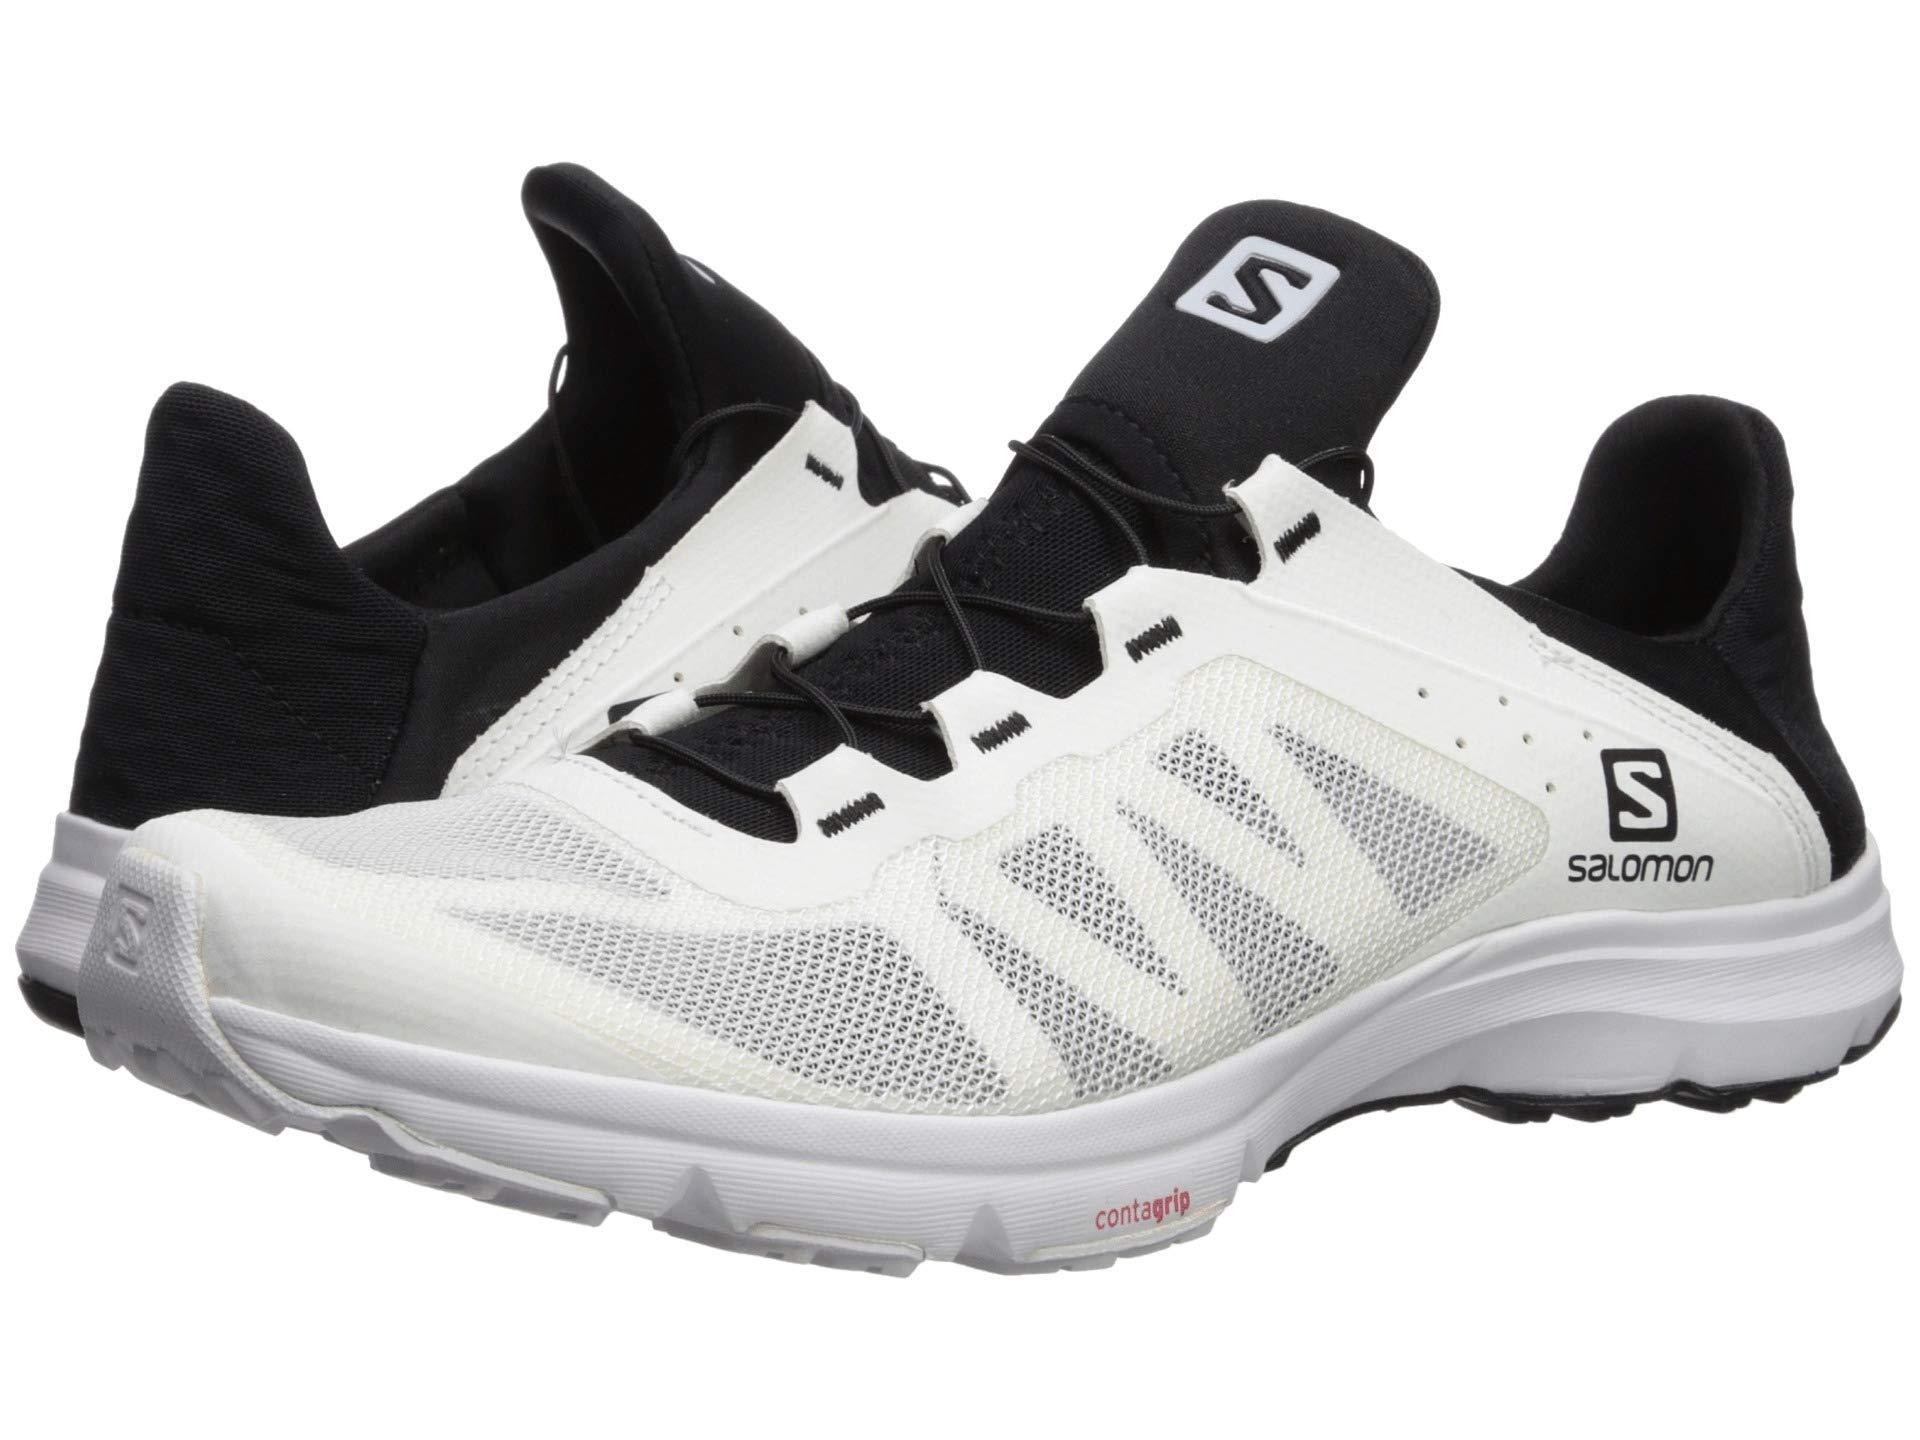 2f33d833468 Yves Salomon Amphib Bold (white/white/black) Men's Shoes in Black ...